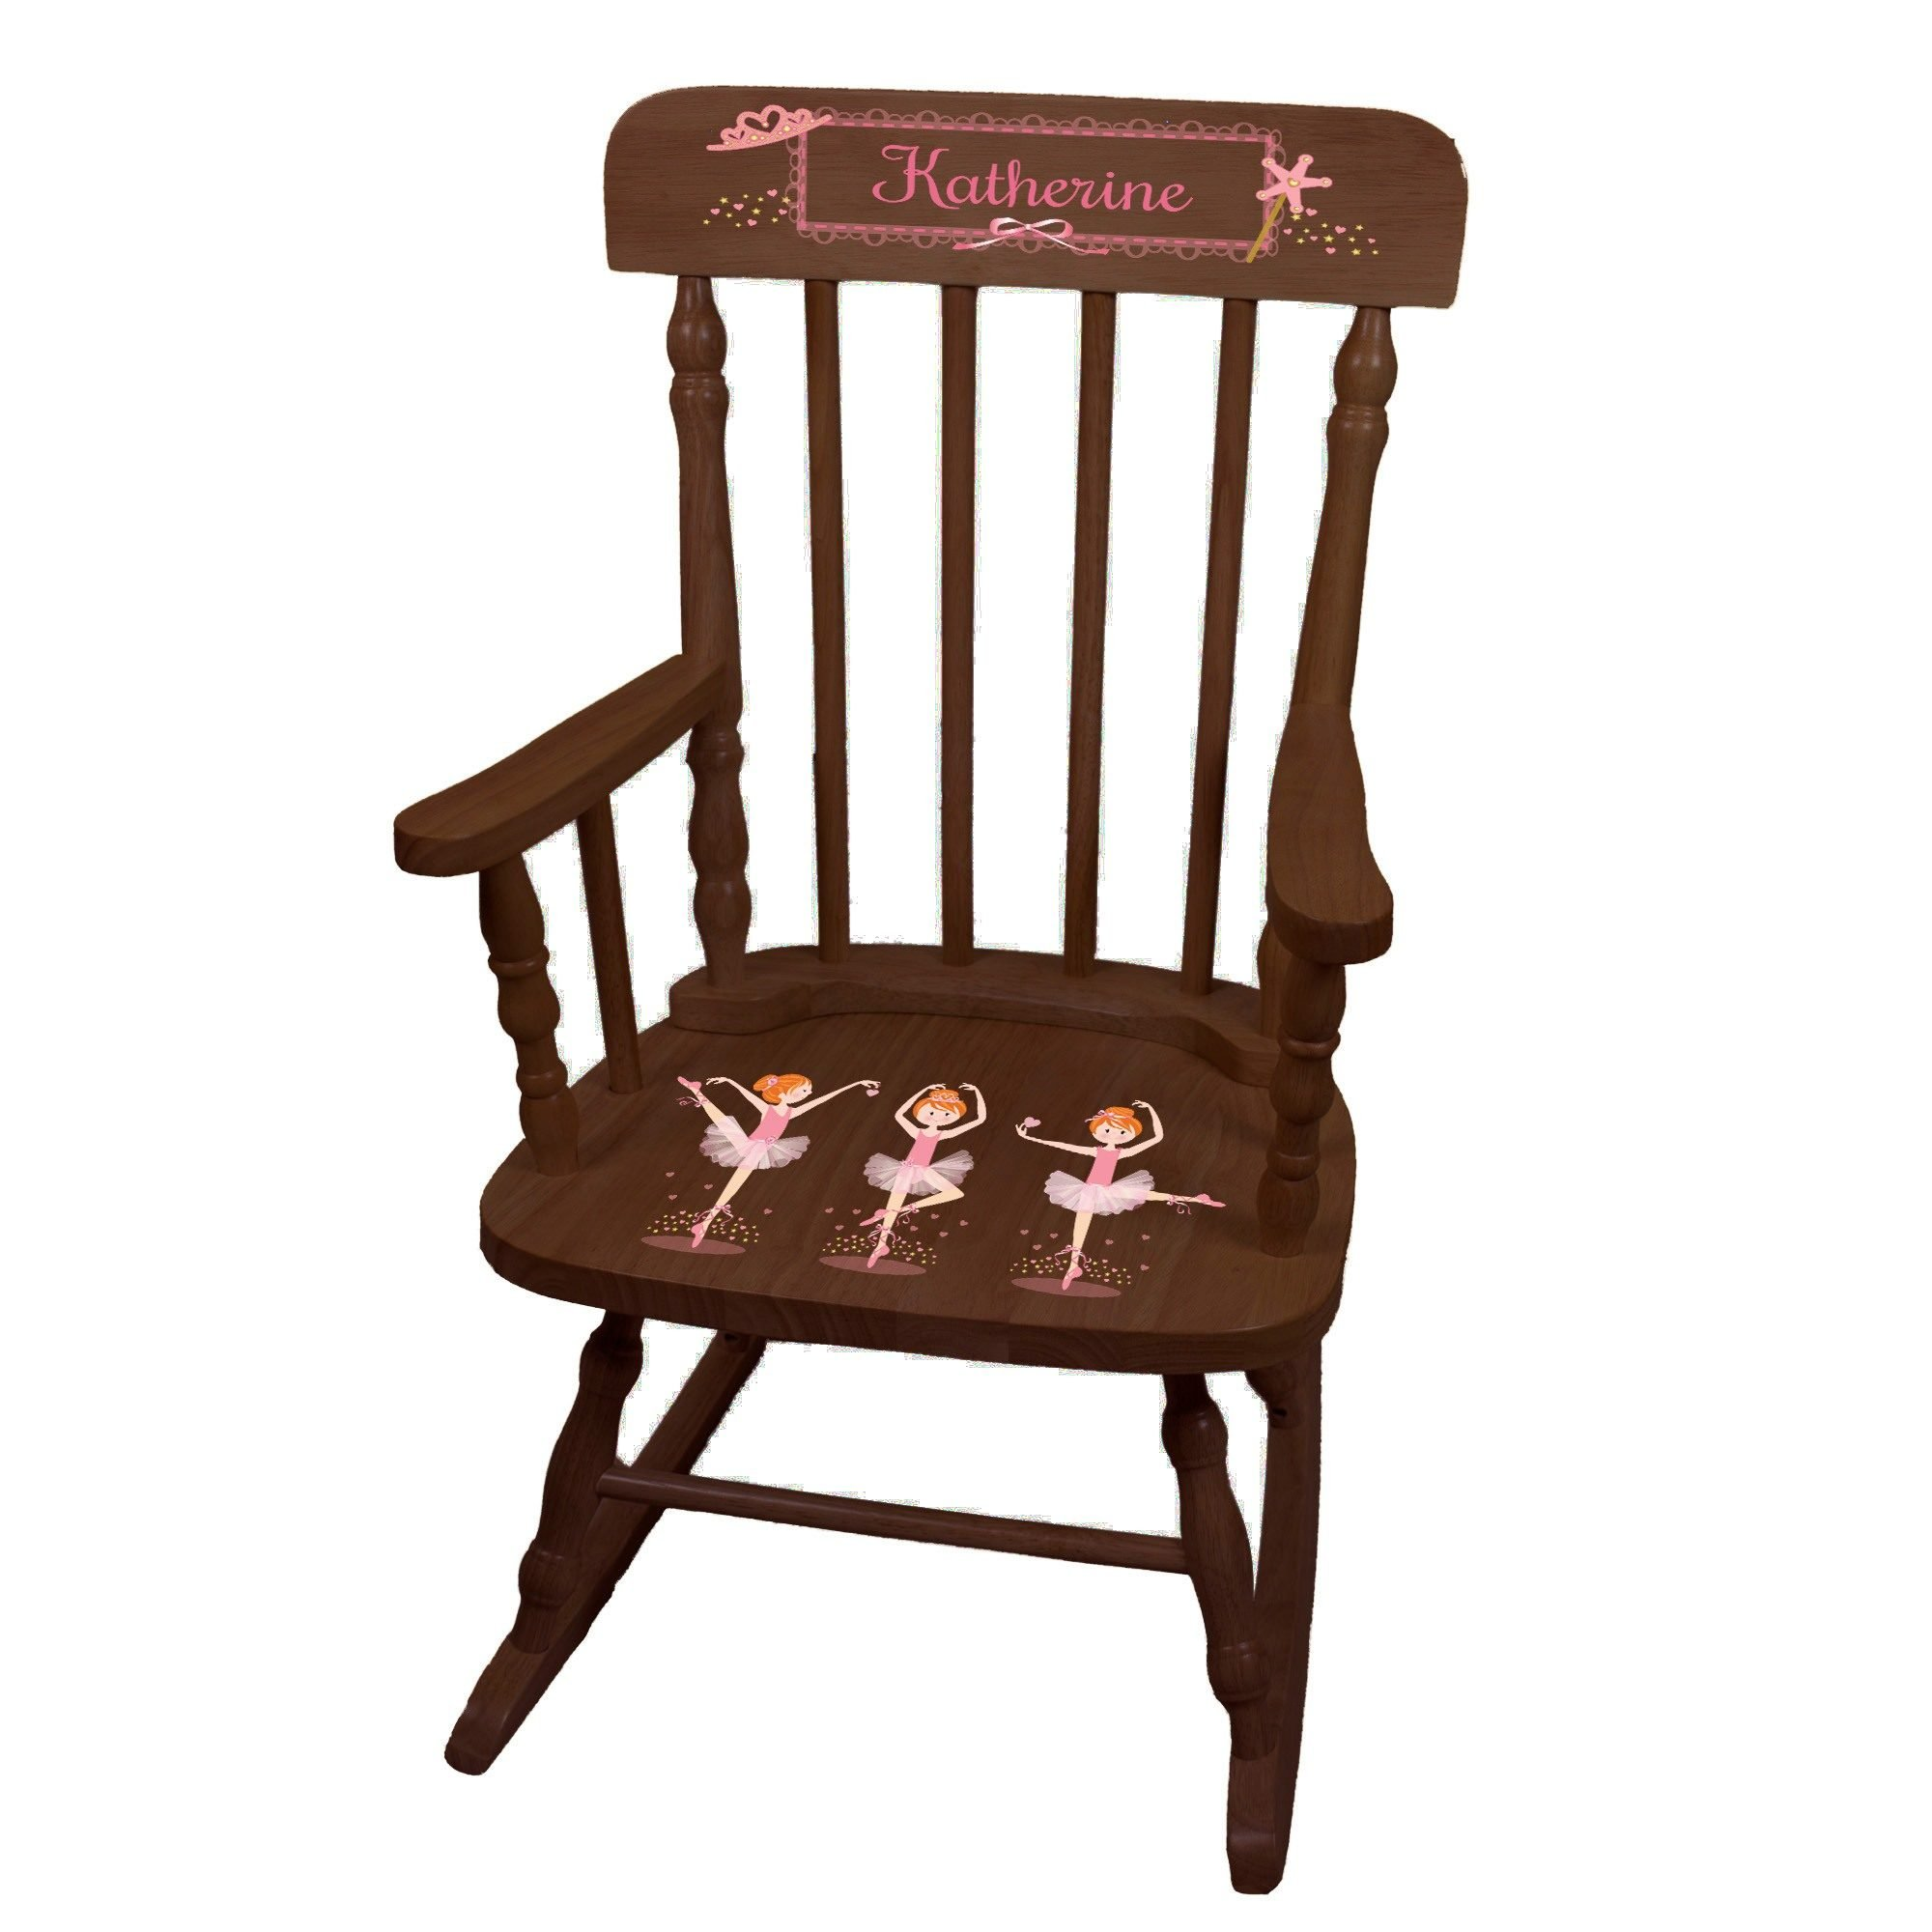 MyBambino Personalized Ballerina Red Hair Espresso Childrens Rocking Chair